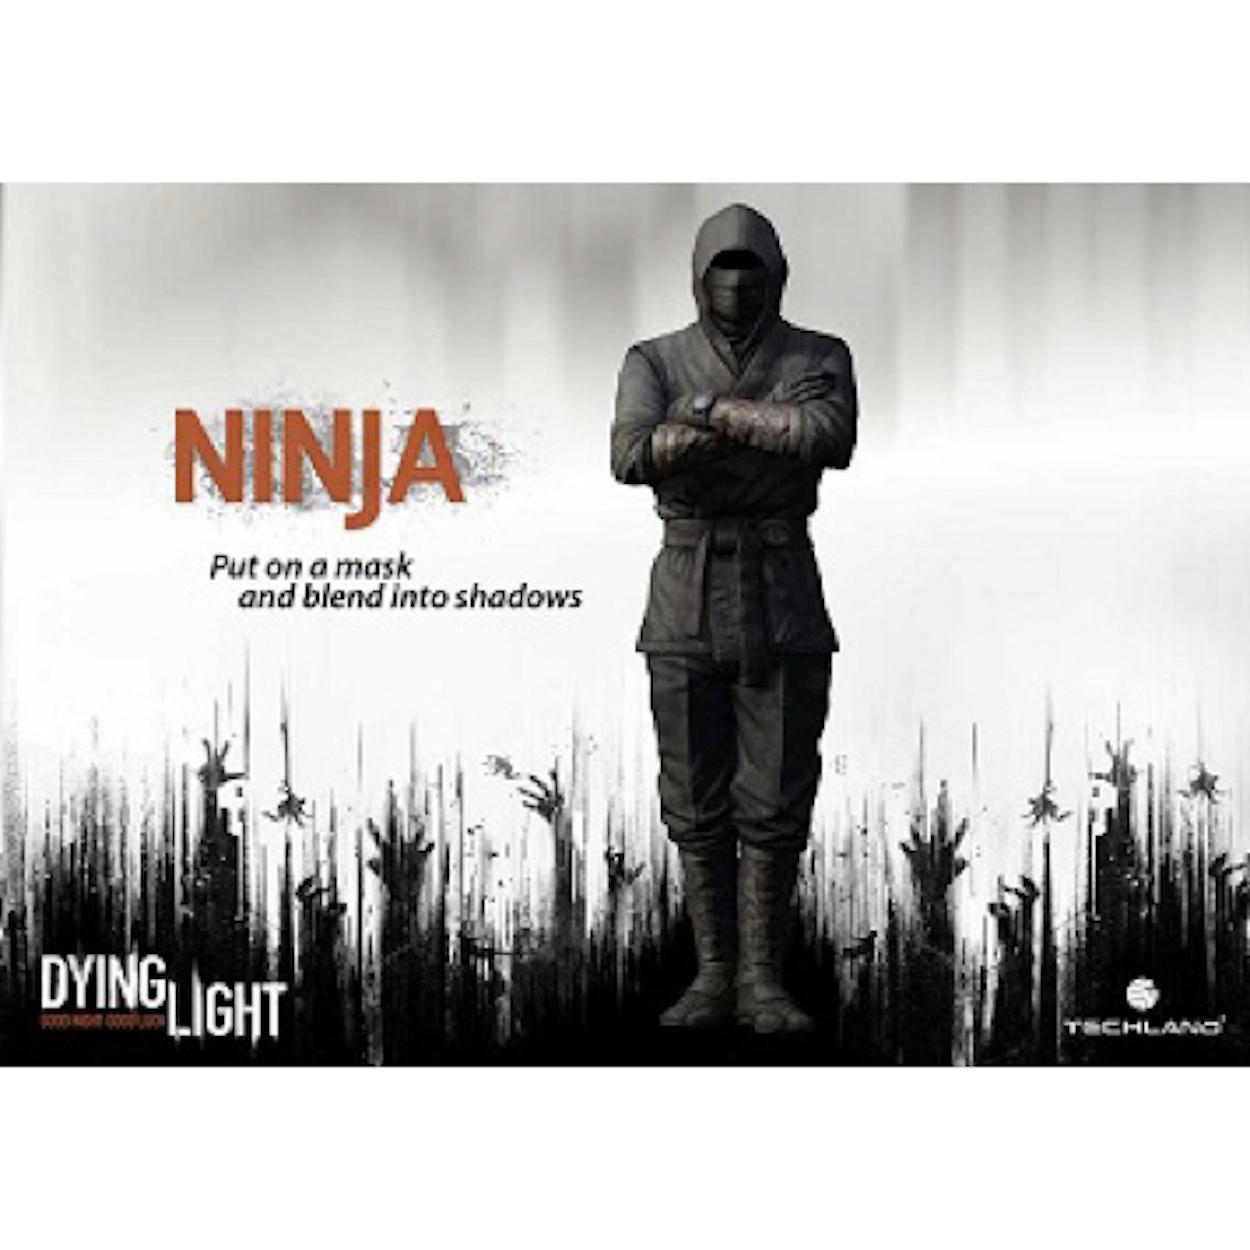 File:Ninja outfit.jpg